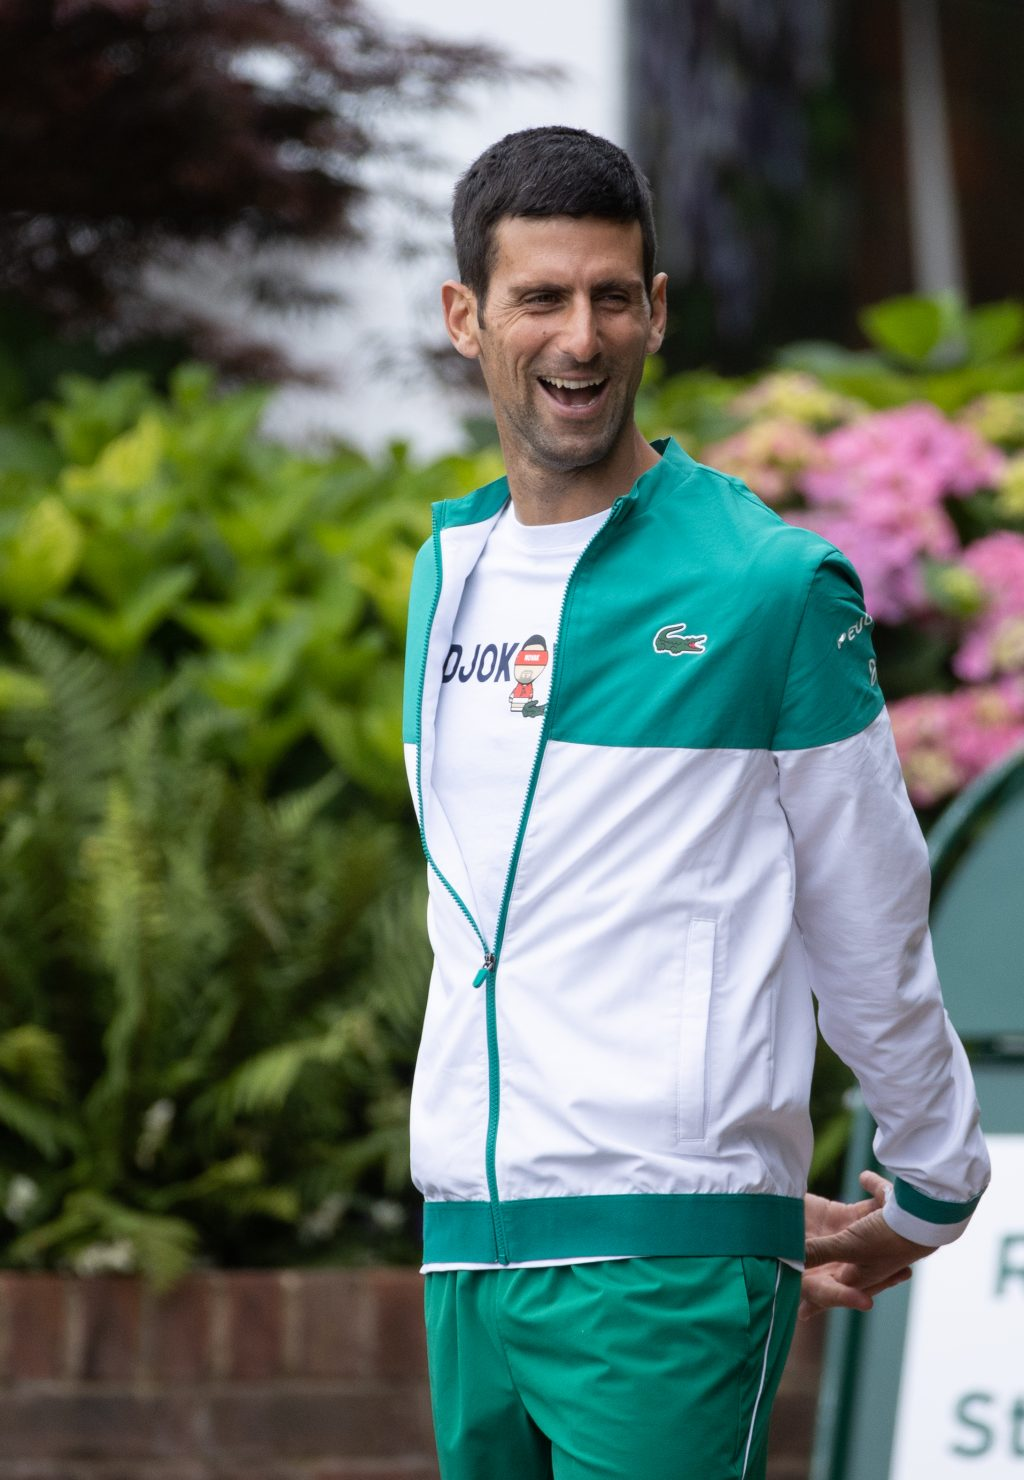 Novak Djokovic stretching